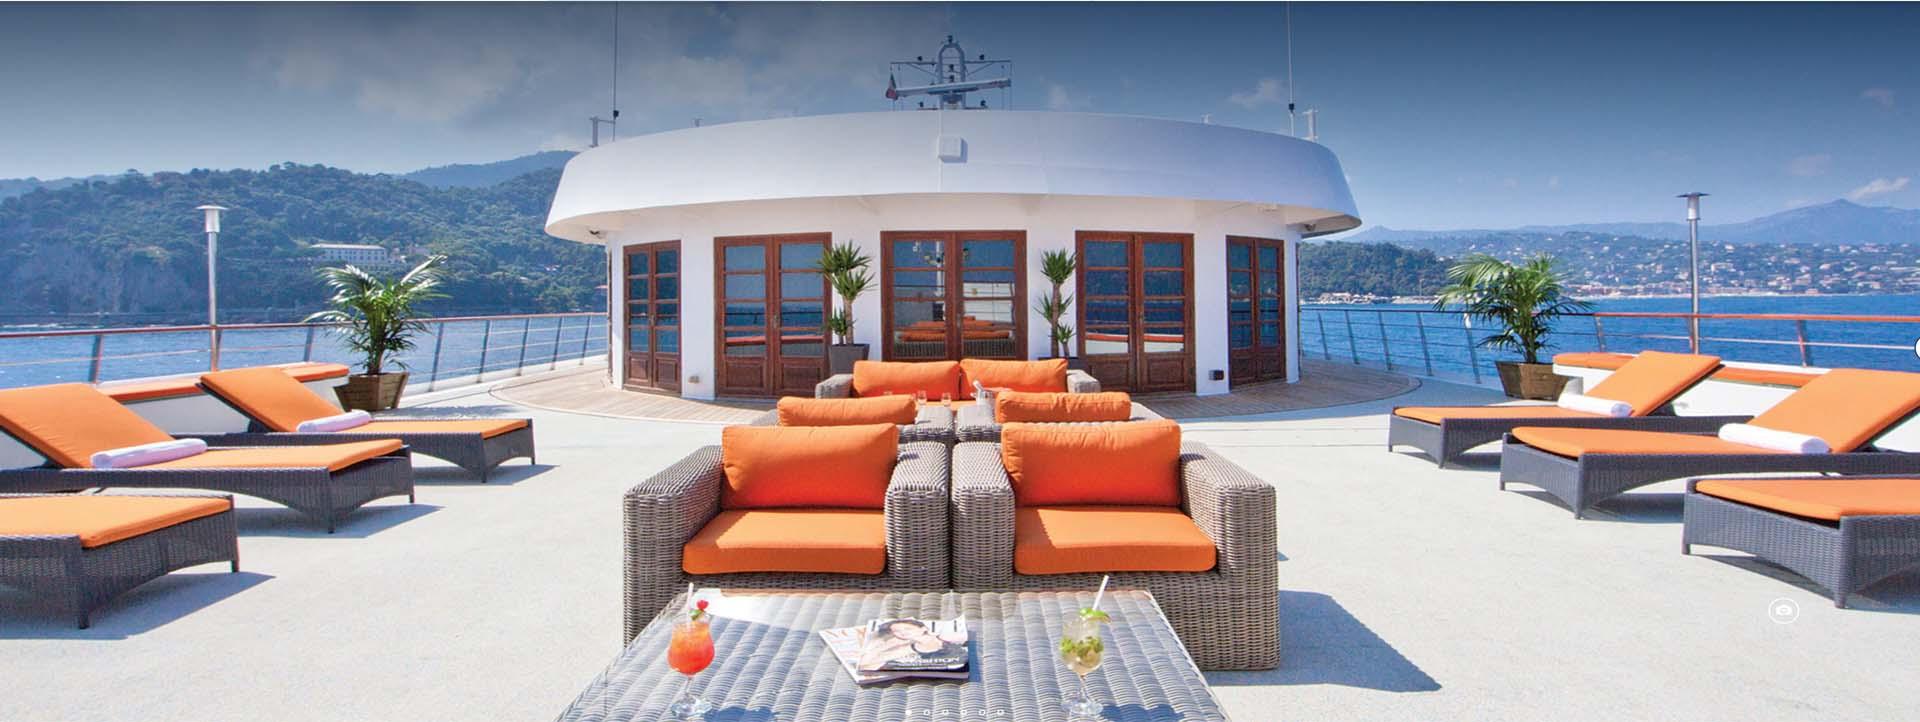 CALEDONIAN SKY top deck cabins slider